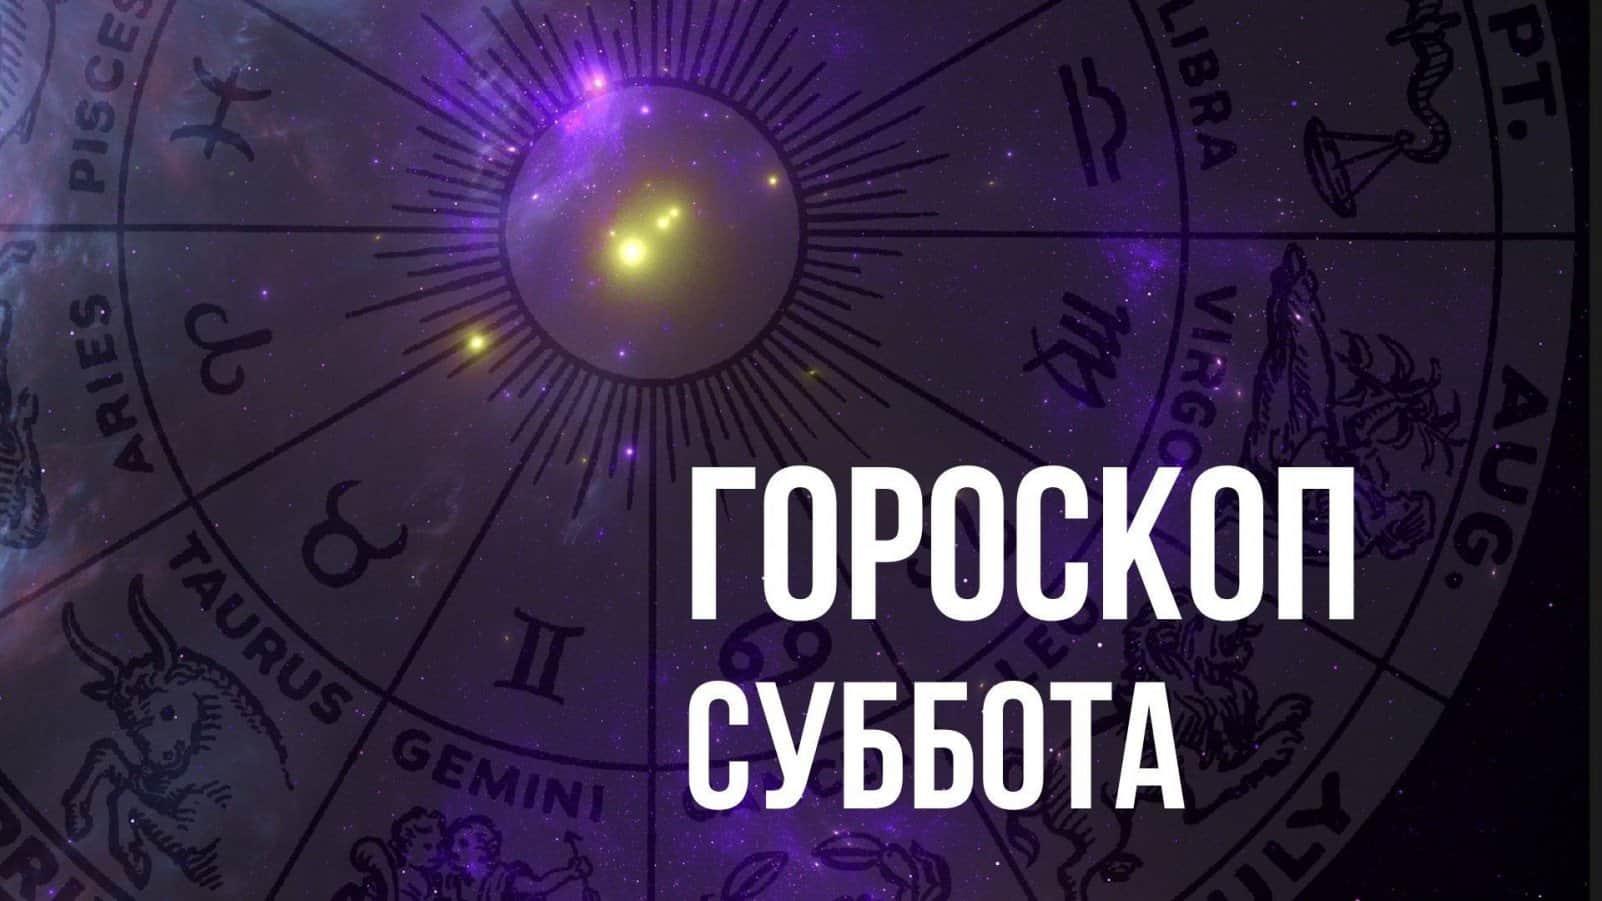 Гороскоп на субботу 3 апреля для каждого знака Зодиака